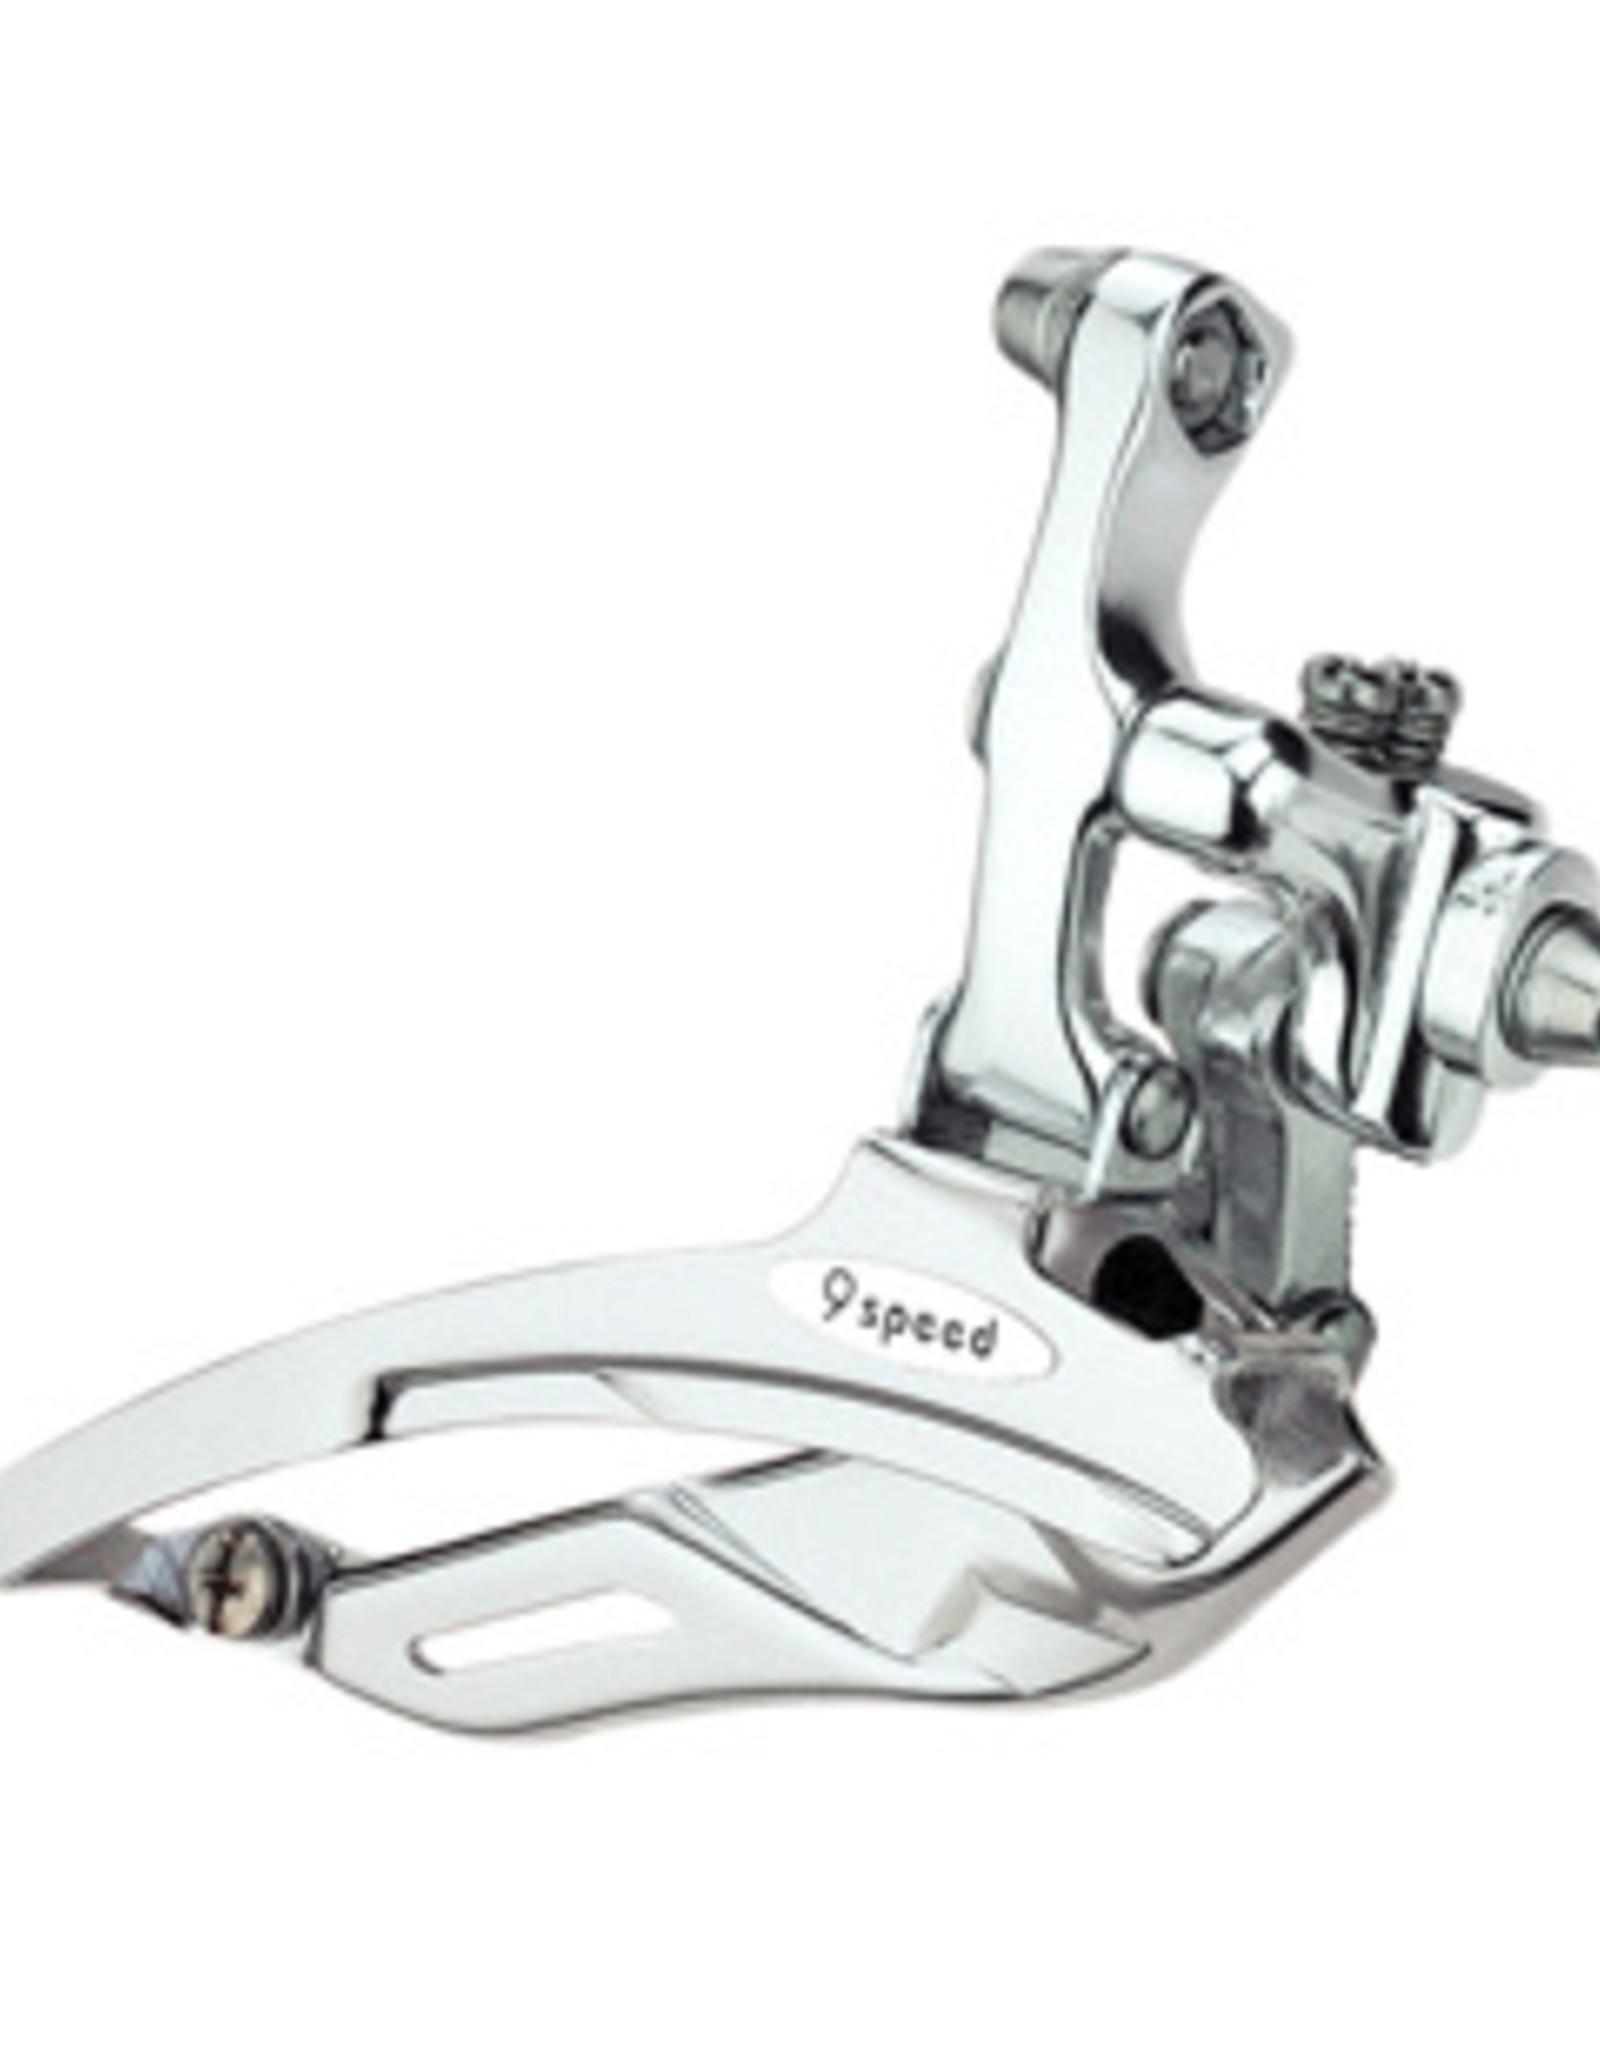 Microshift FD-R439 9 Speed Road Flat Bar Triple Front Derailleur